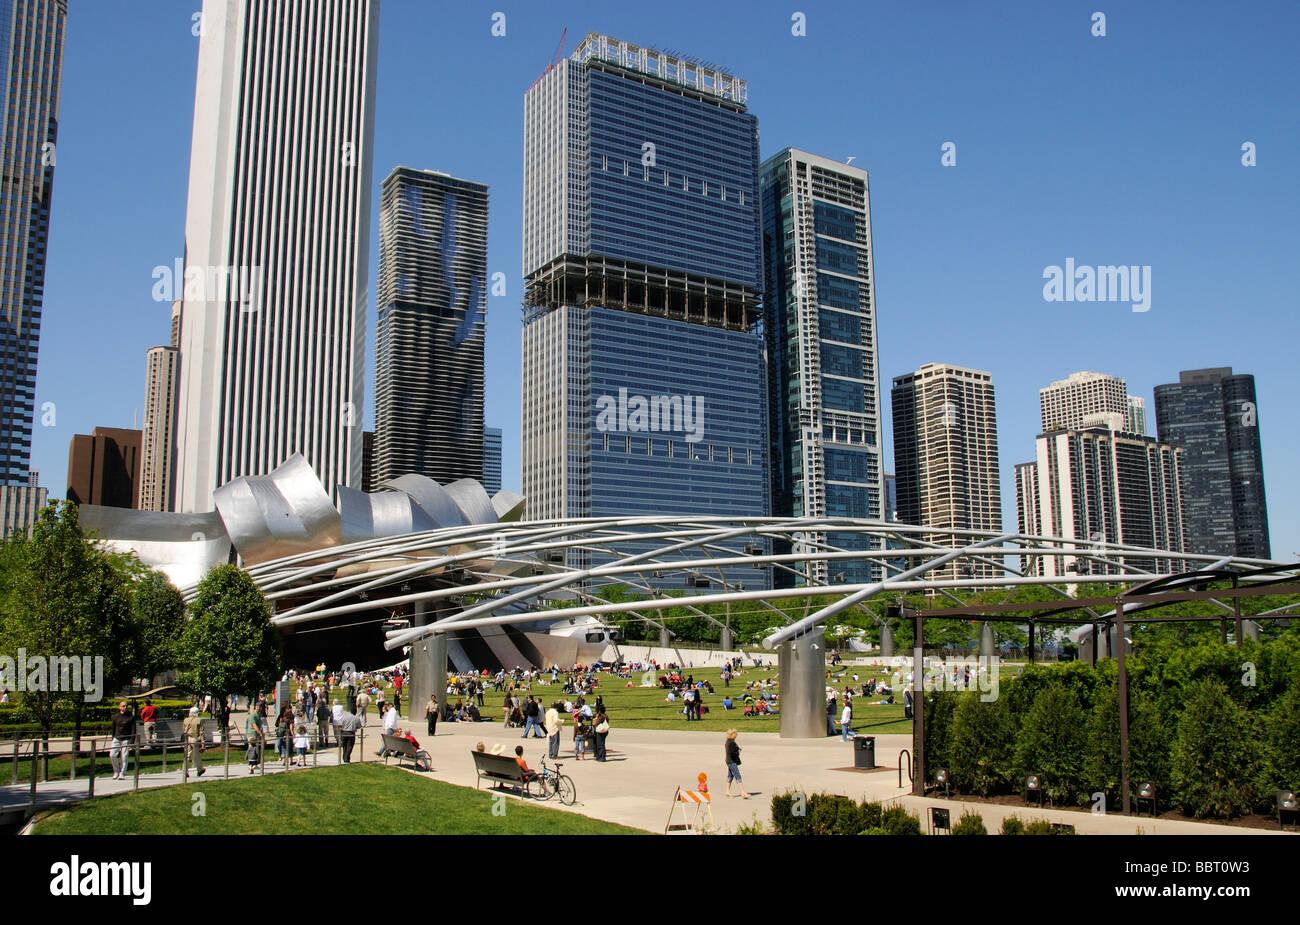 The Jay Pritzker Pavilion in Millennium Park downtown Chicago Illinois USA - Stock Image